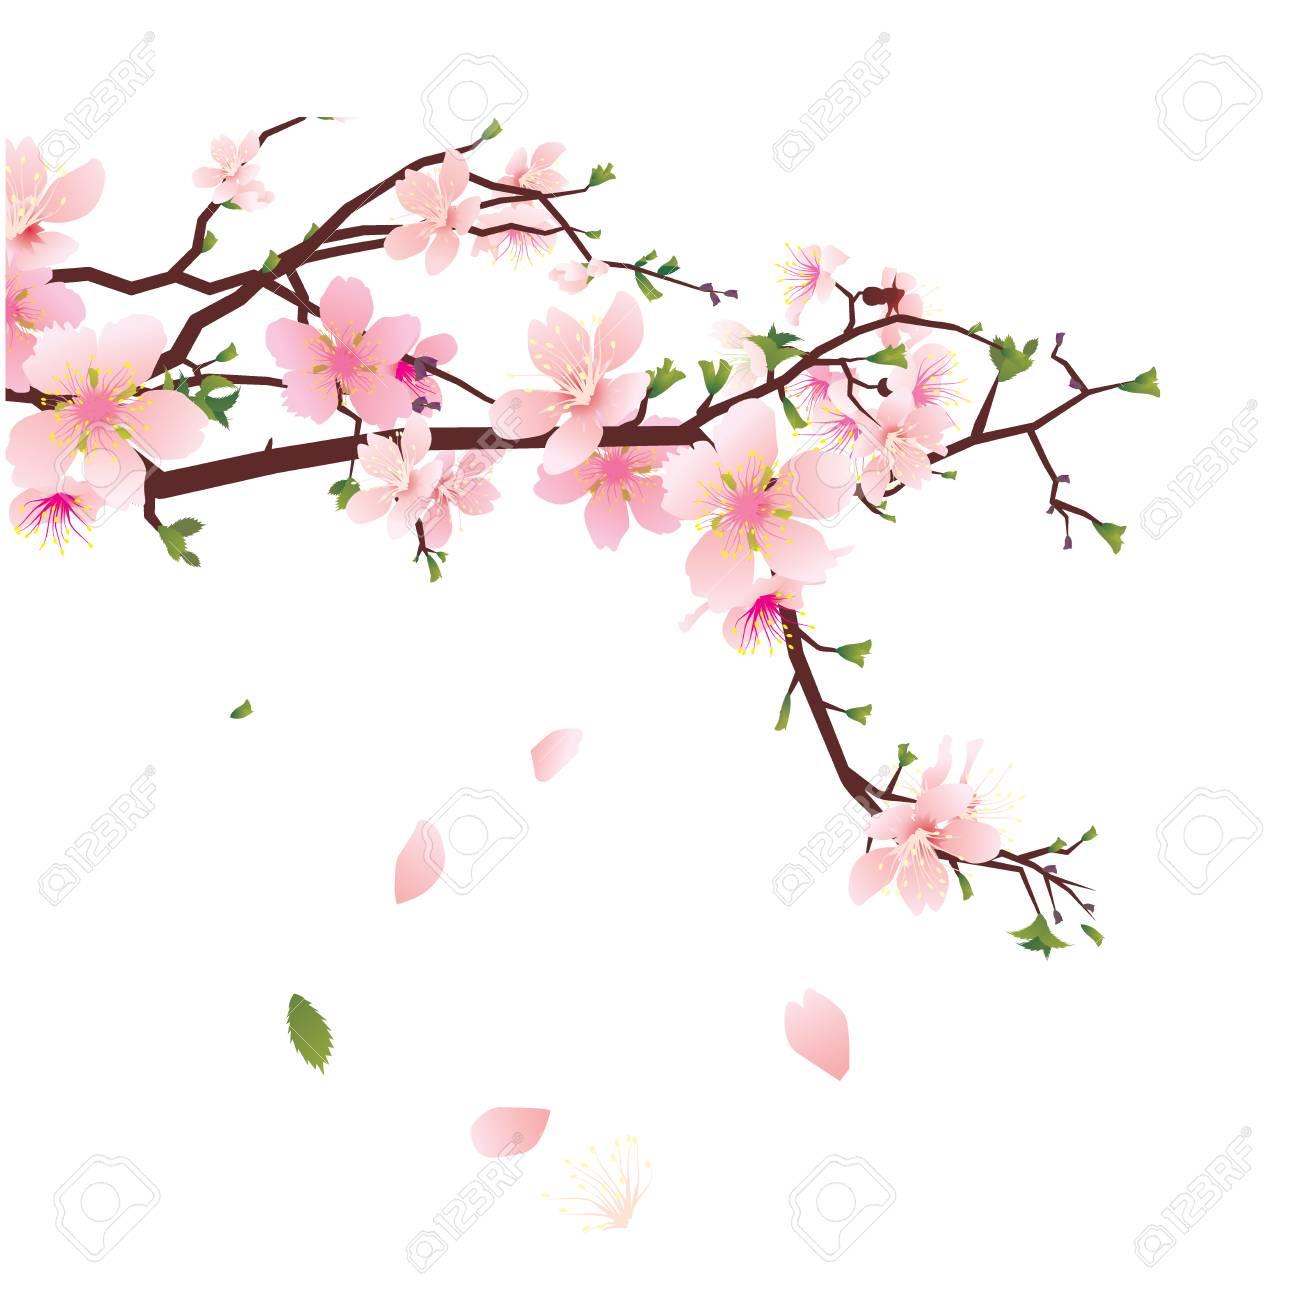 Japanese Flowers on white background.